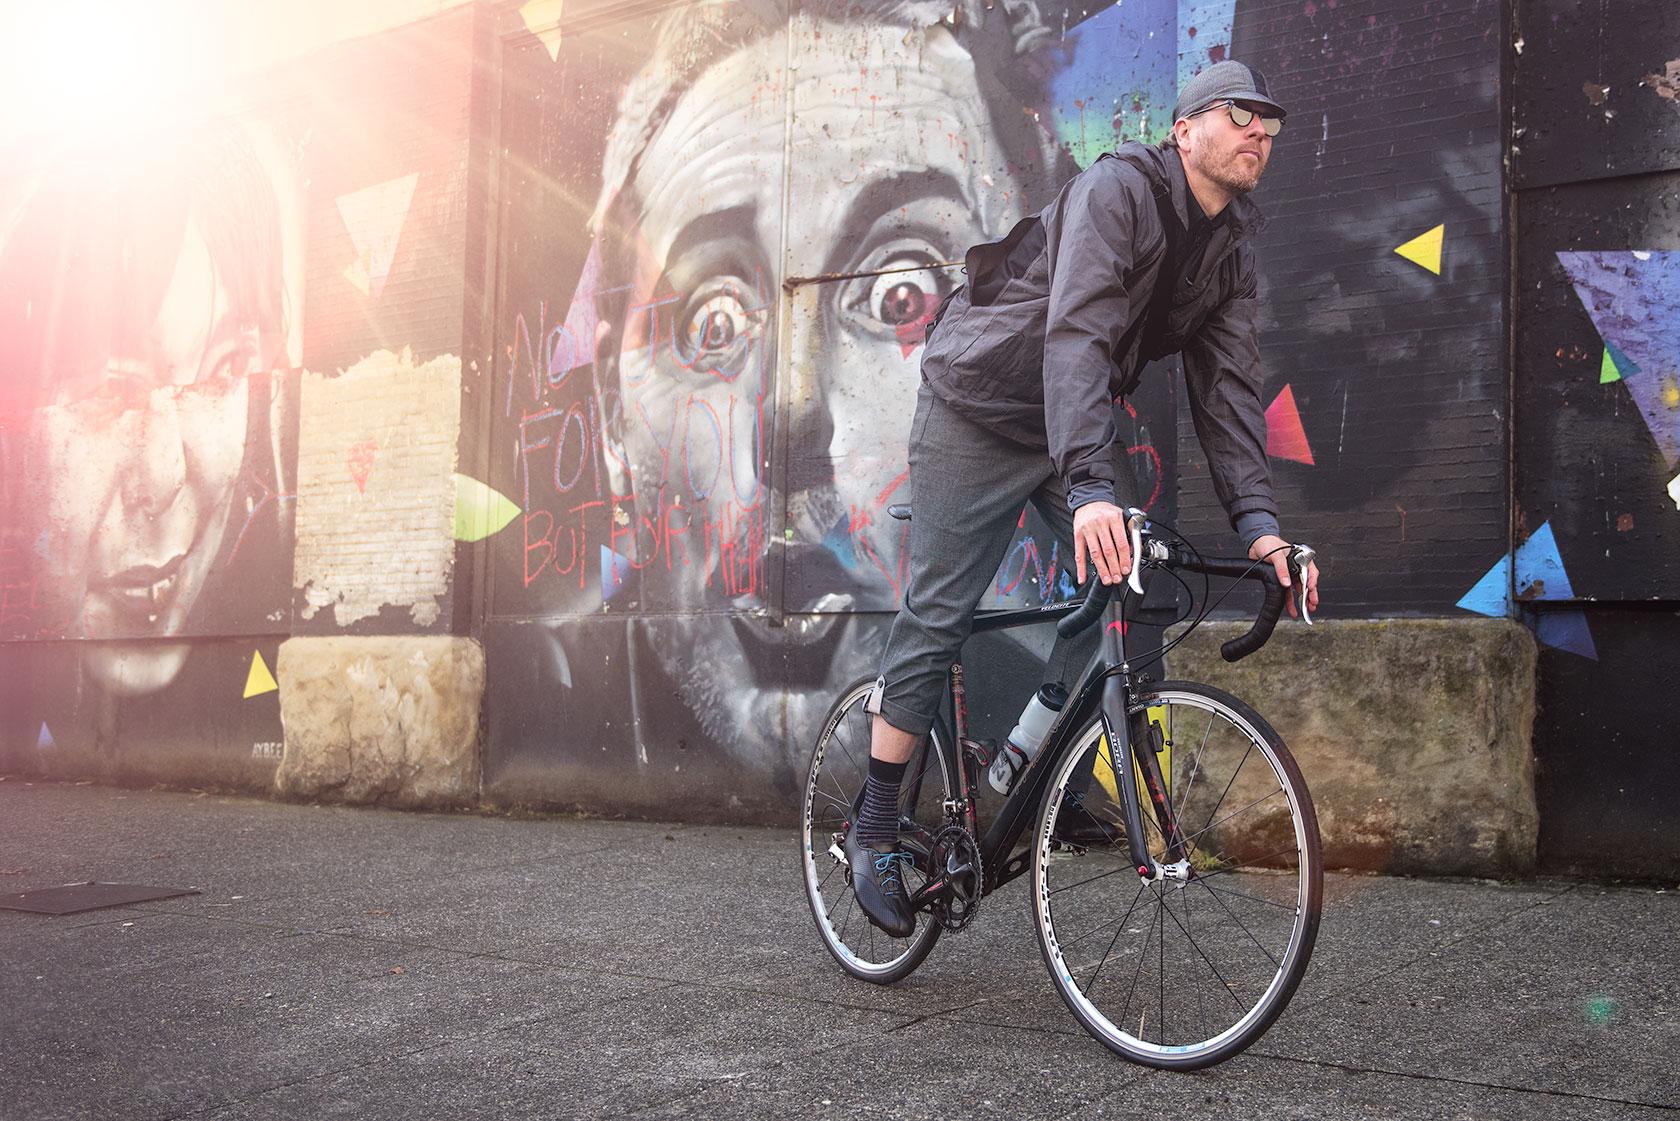 austin-trigg-seattle-bicycle-company-lifestyle-graffiti.jpg